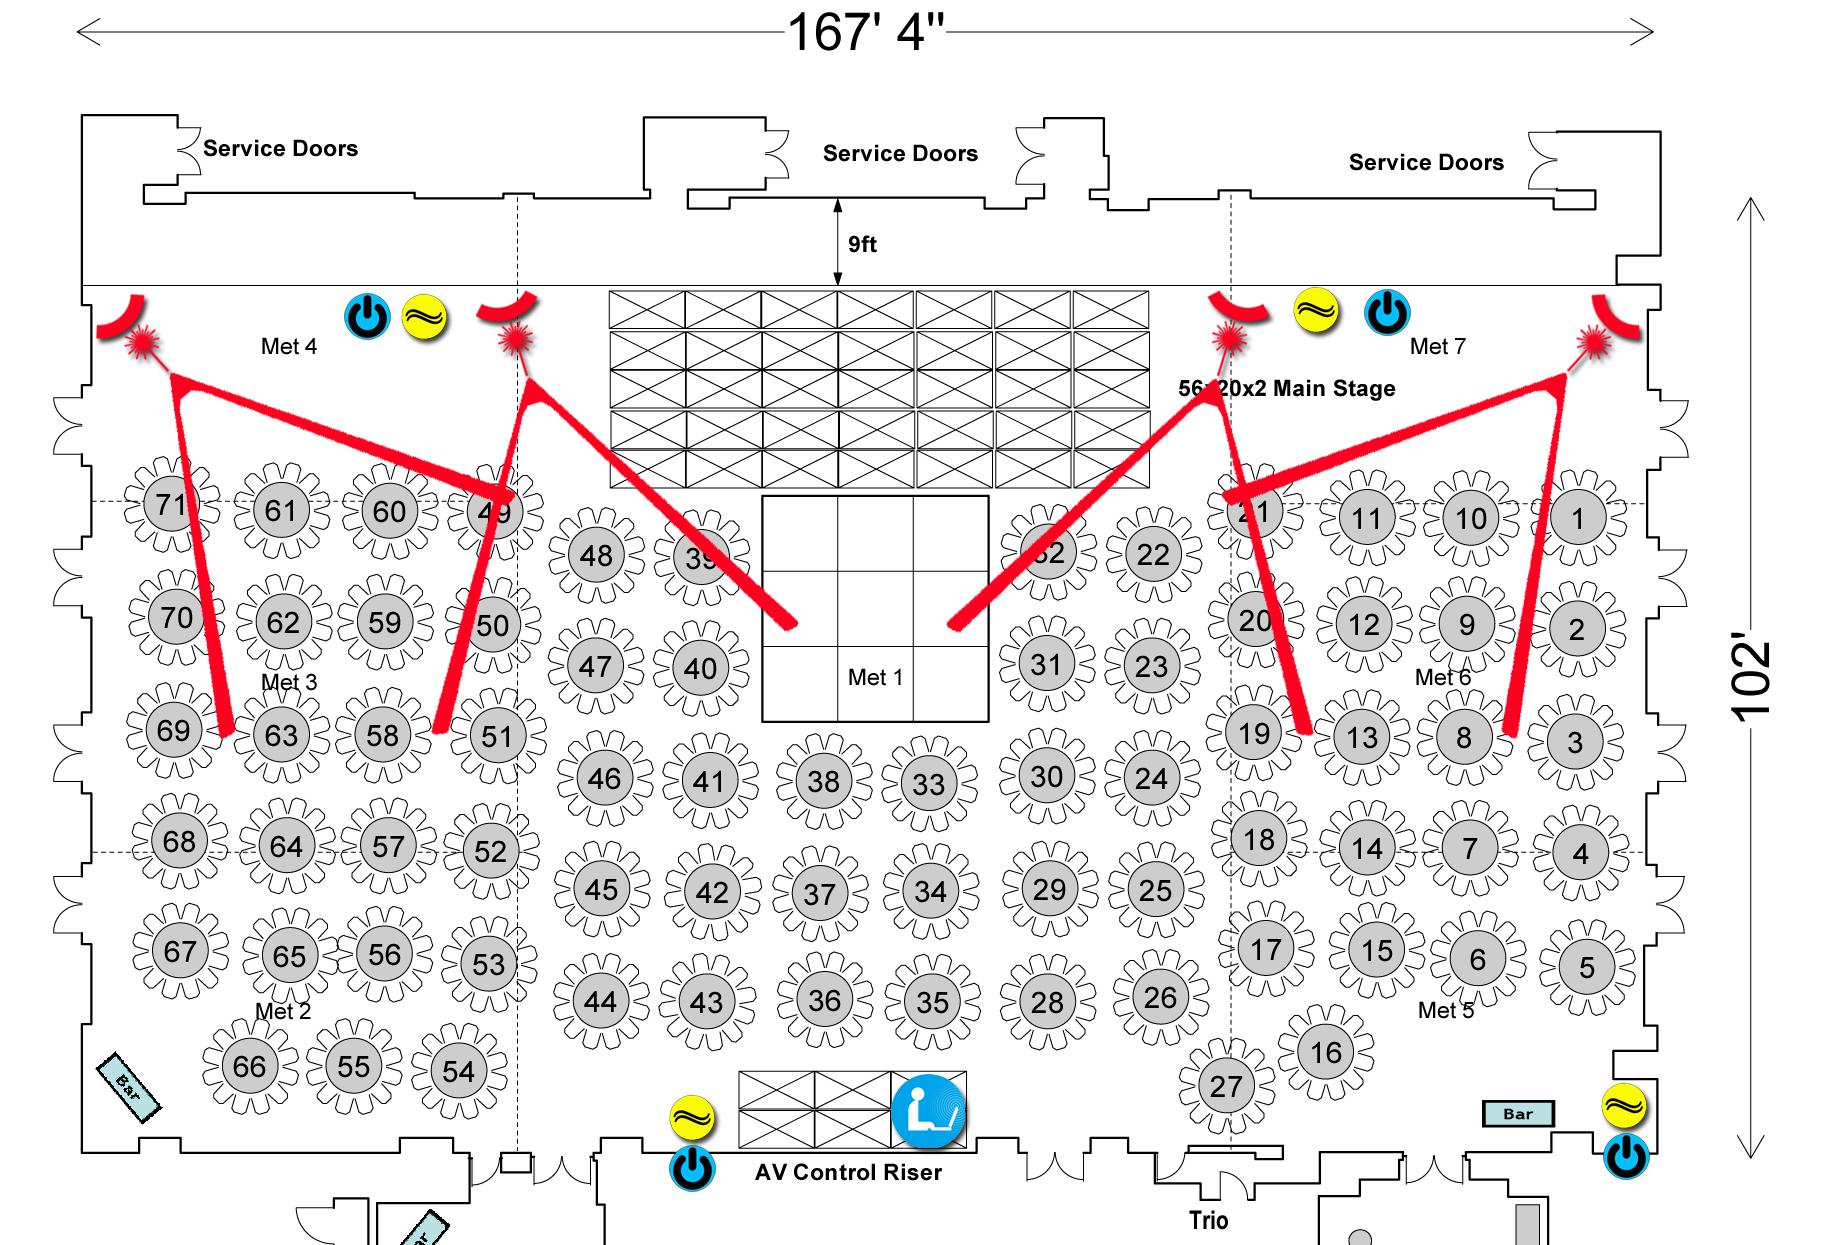 Masri-5-16-15-St-Jude-Gala-Floorplan-DV2.jpg